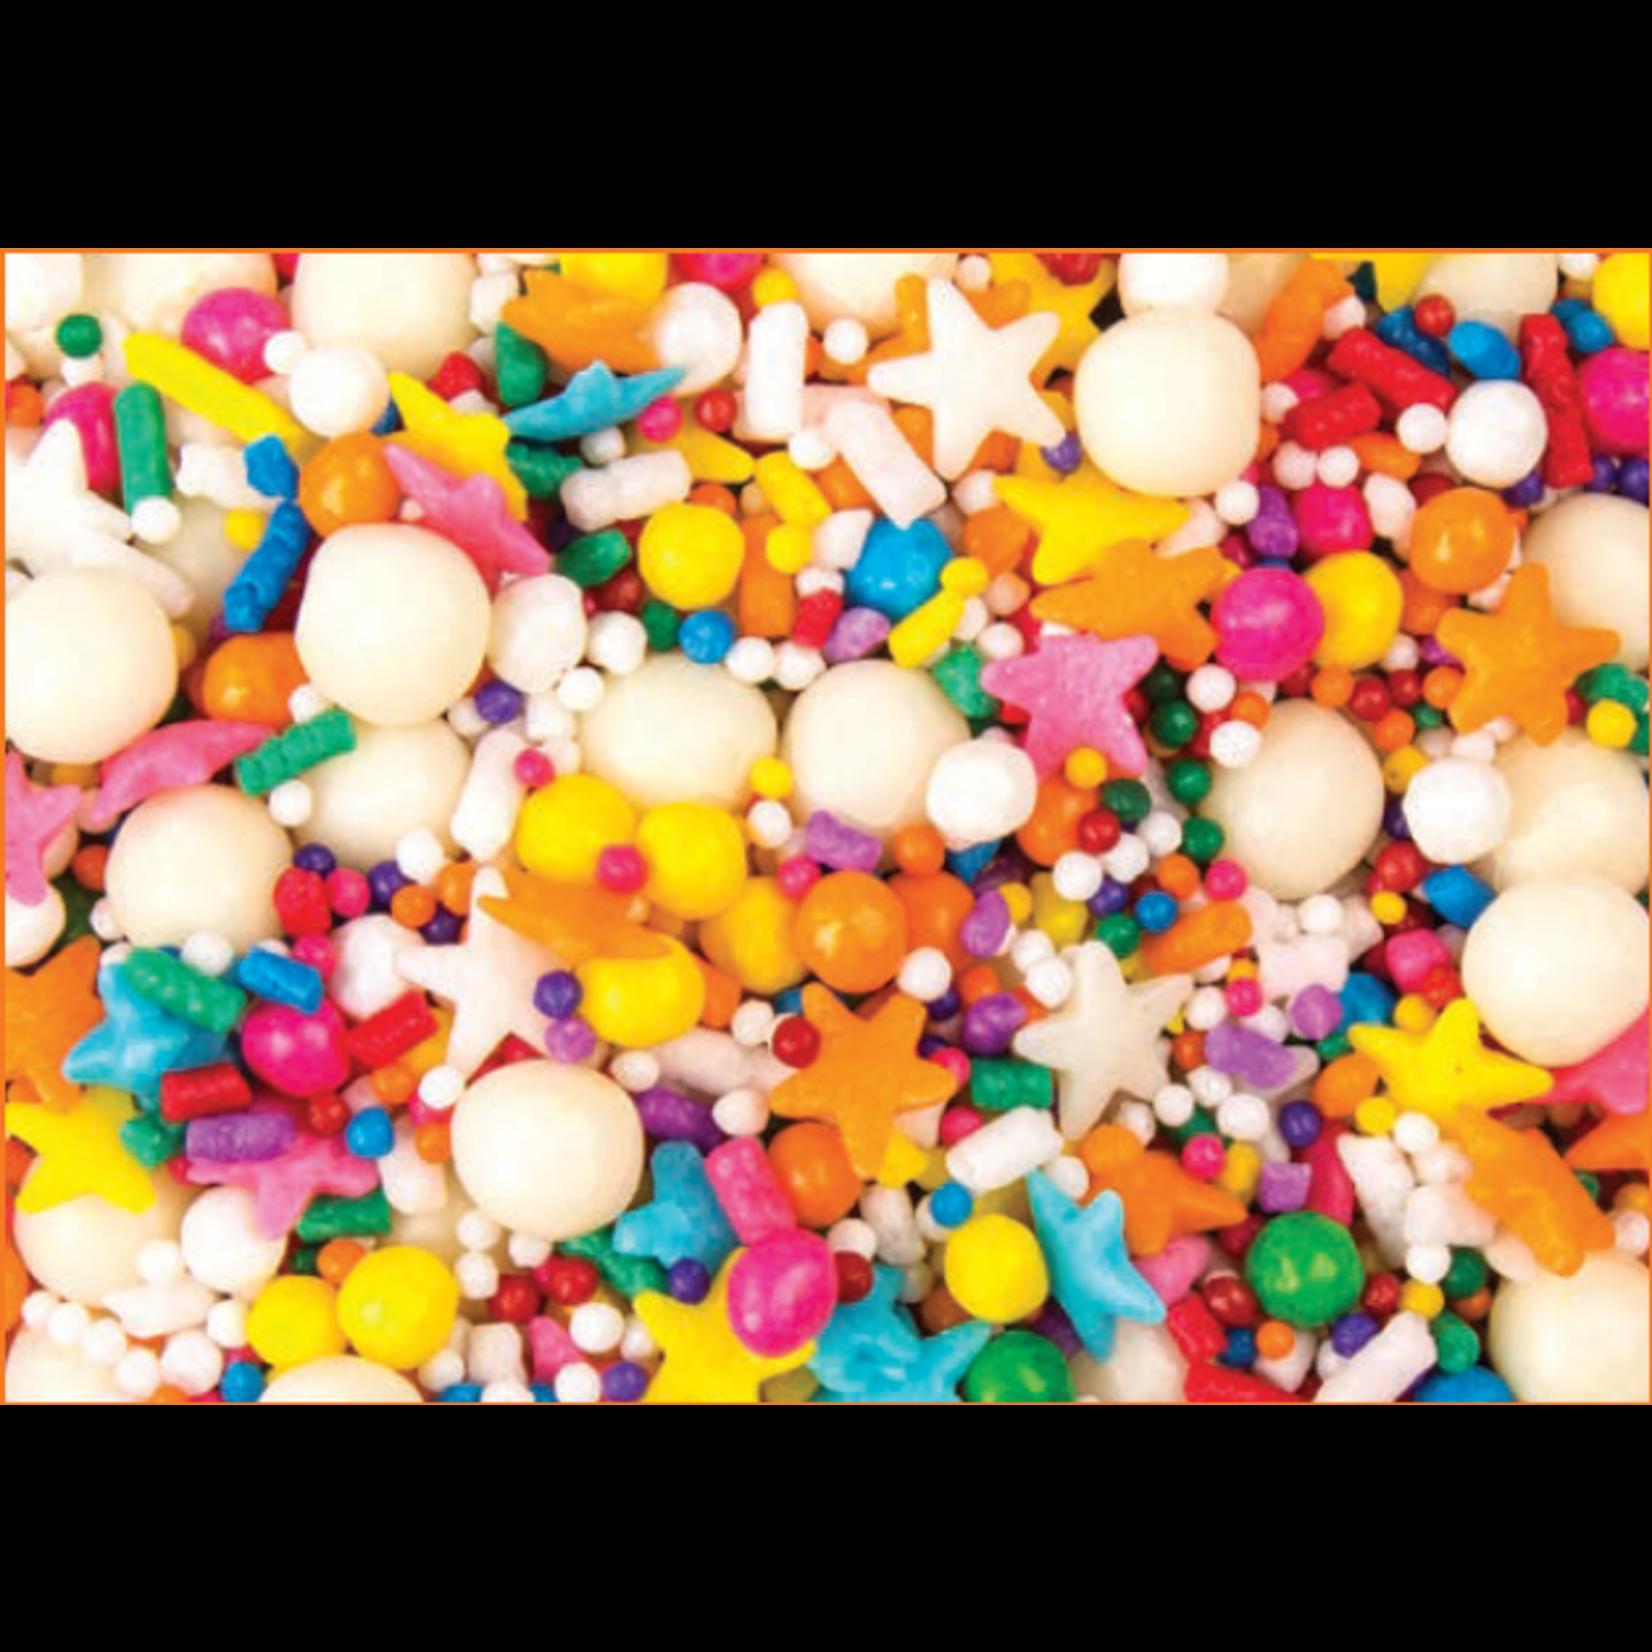 Mavalerio Mavalerio - Graffiti Sprinkle Mix, Rainbow Explosion - 4lb, 8977